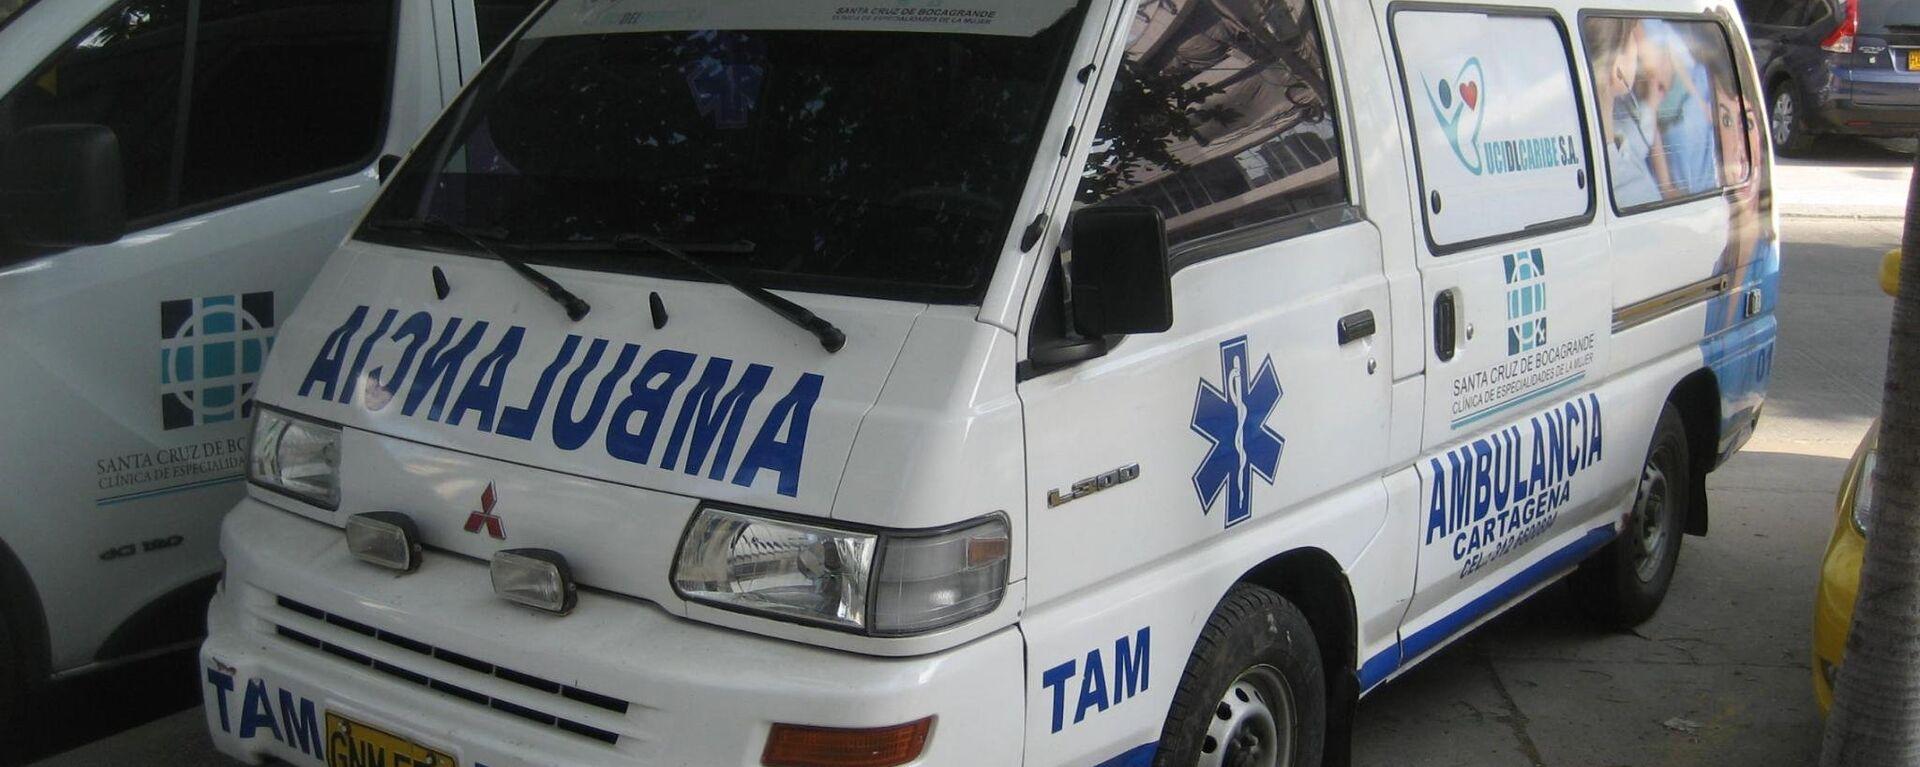 Ambulancia colombiana - Sputnik Mundo, 1920, 30.04.2021